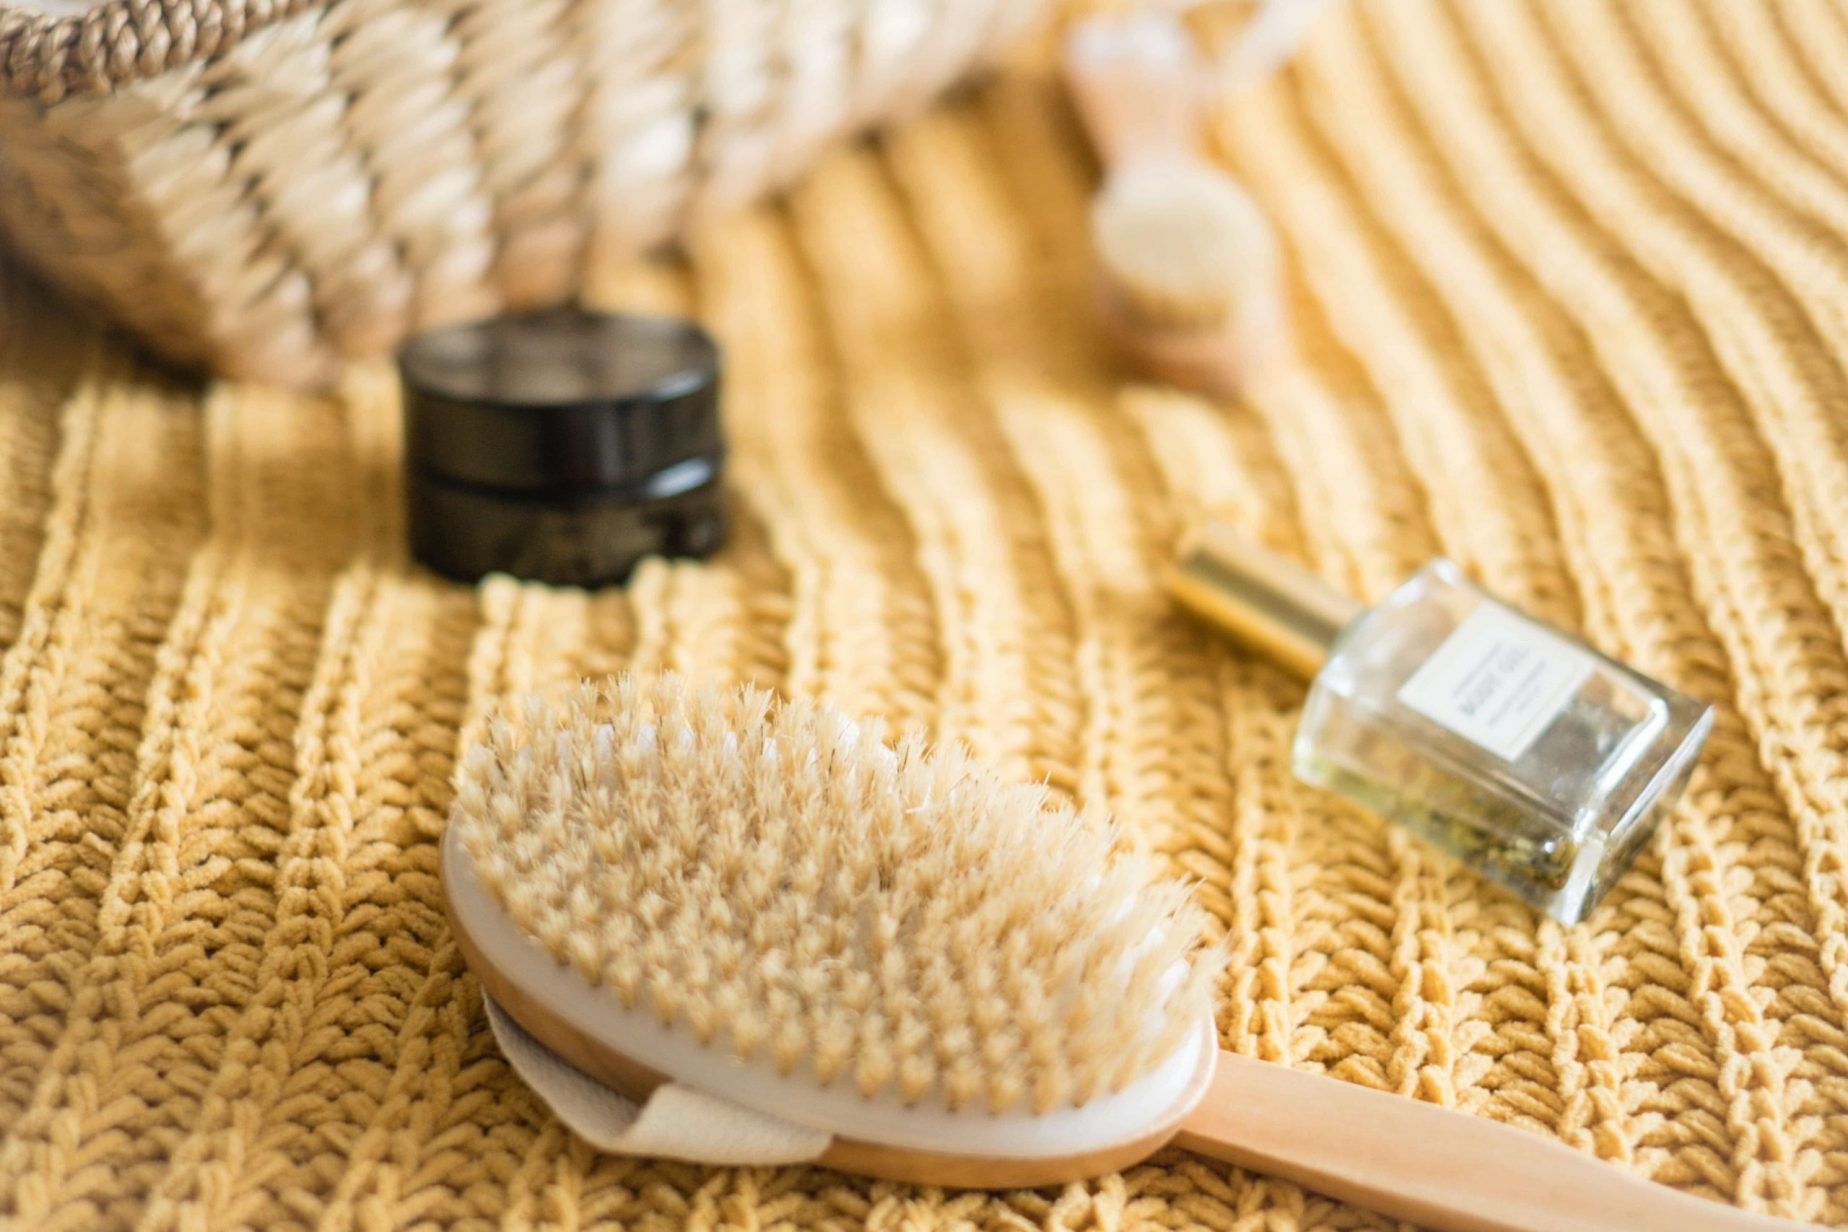 Why You Should Be Dry Brushing Your Skin #whatsavvysaid #ontheblog #wellness #healthyhabits #drybrushing #exfoliate #drybrush #wellnesstips #showerroutine #bodyoil #bodybrush